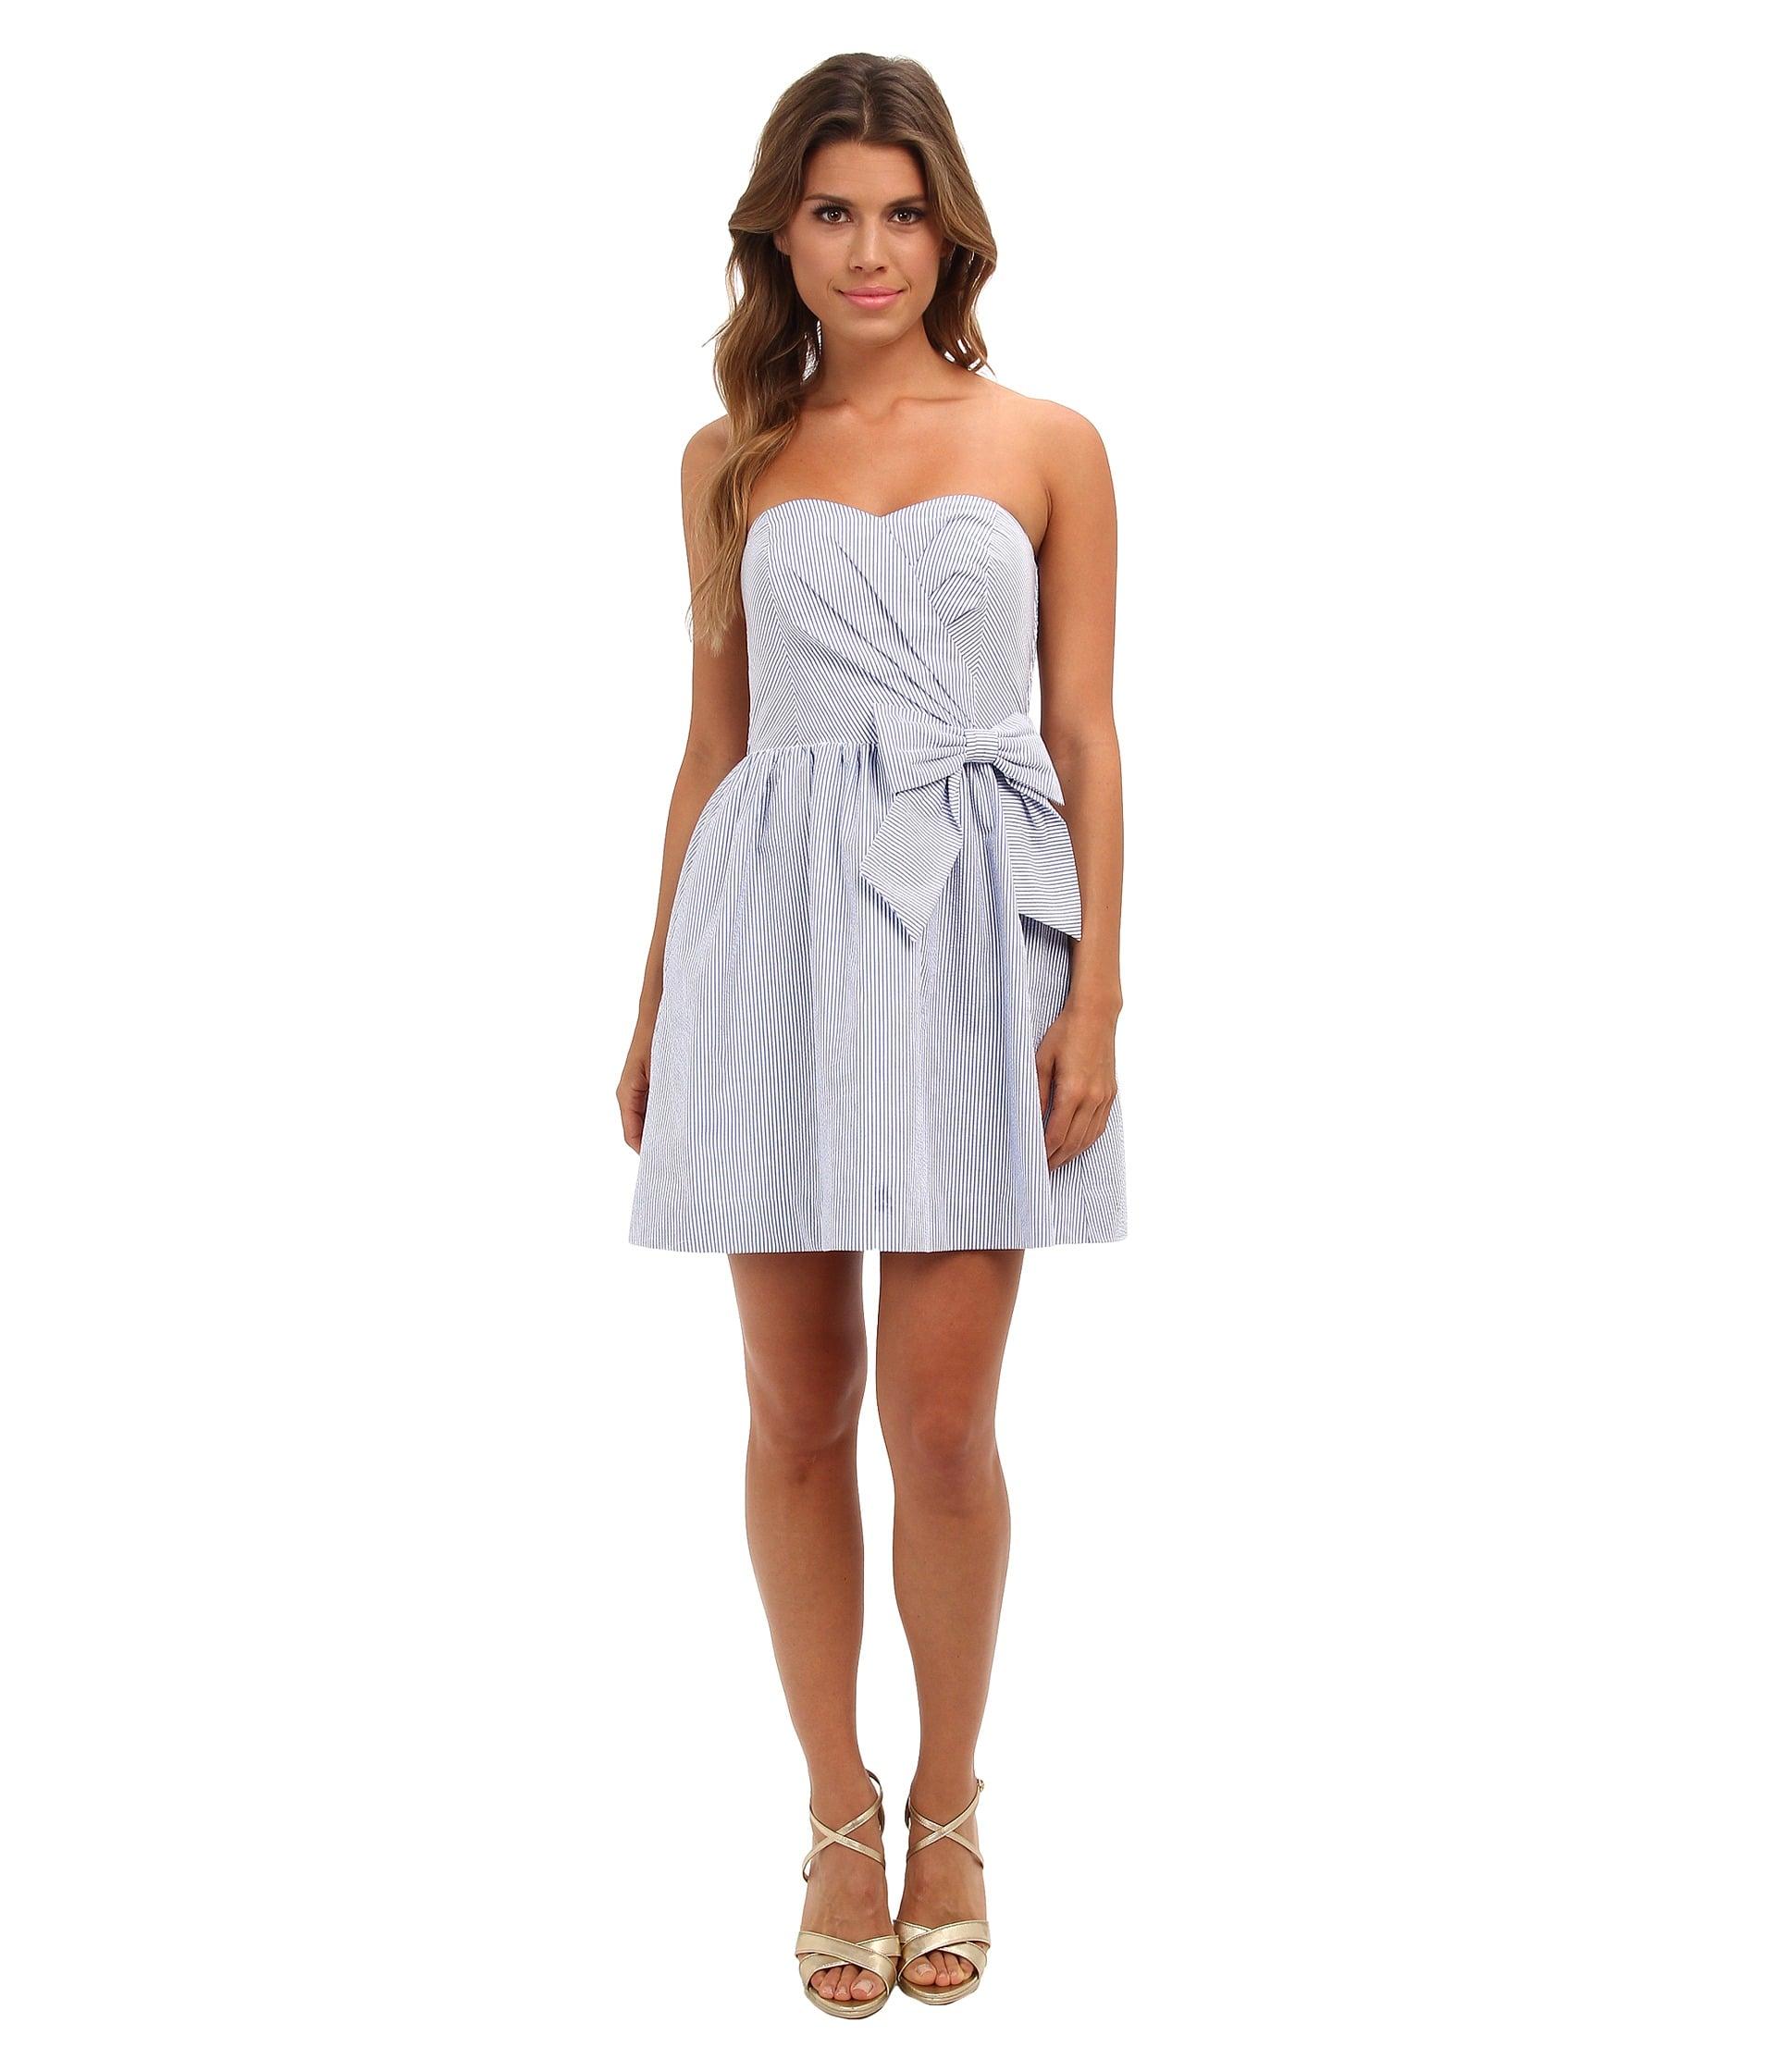 Lilly Pulitzer Henrietta Dress